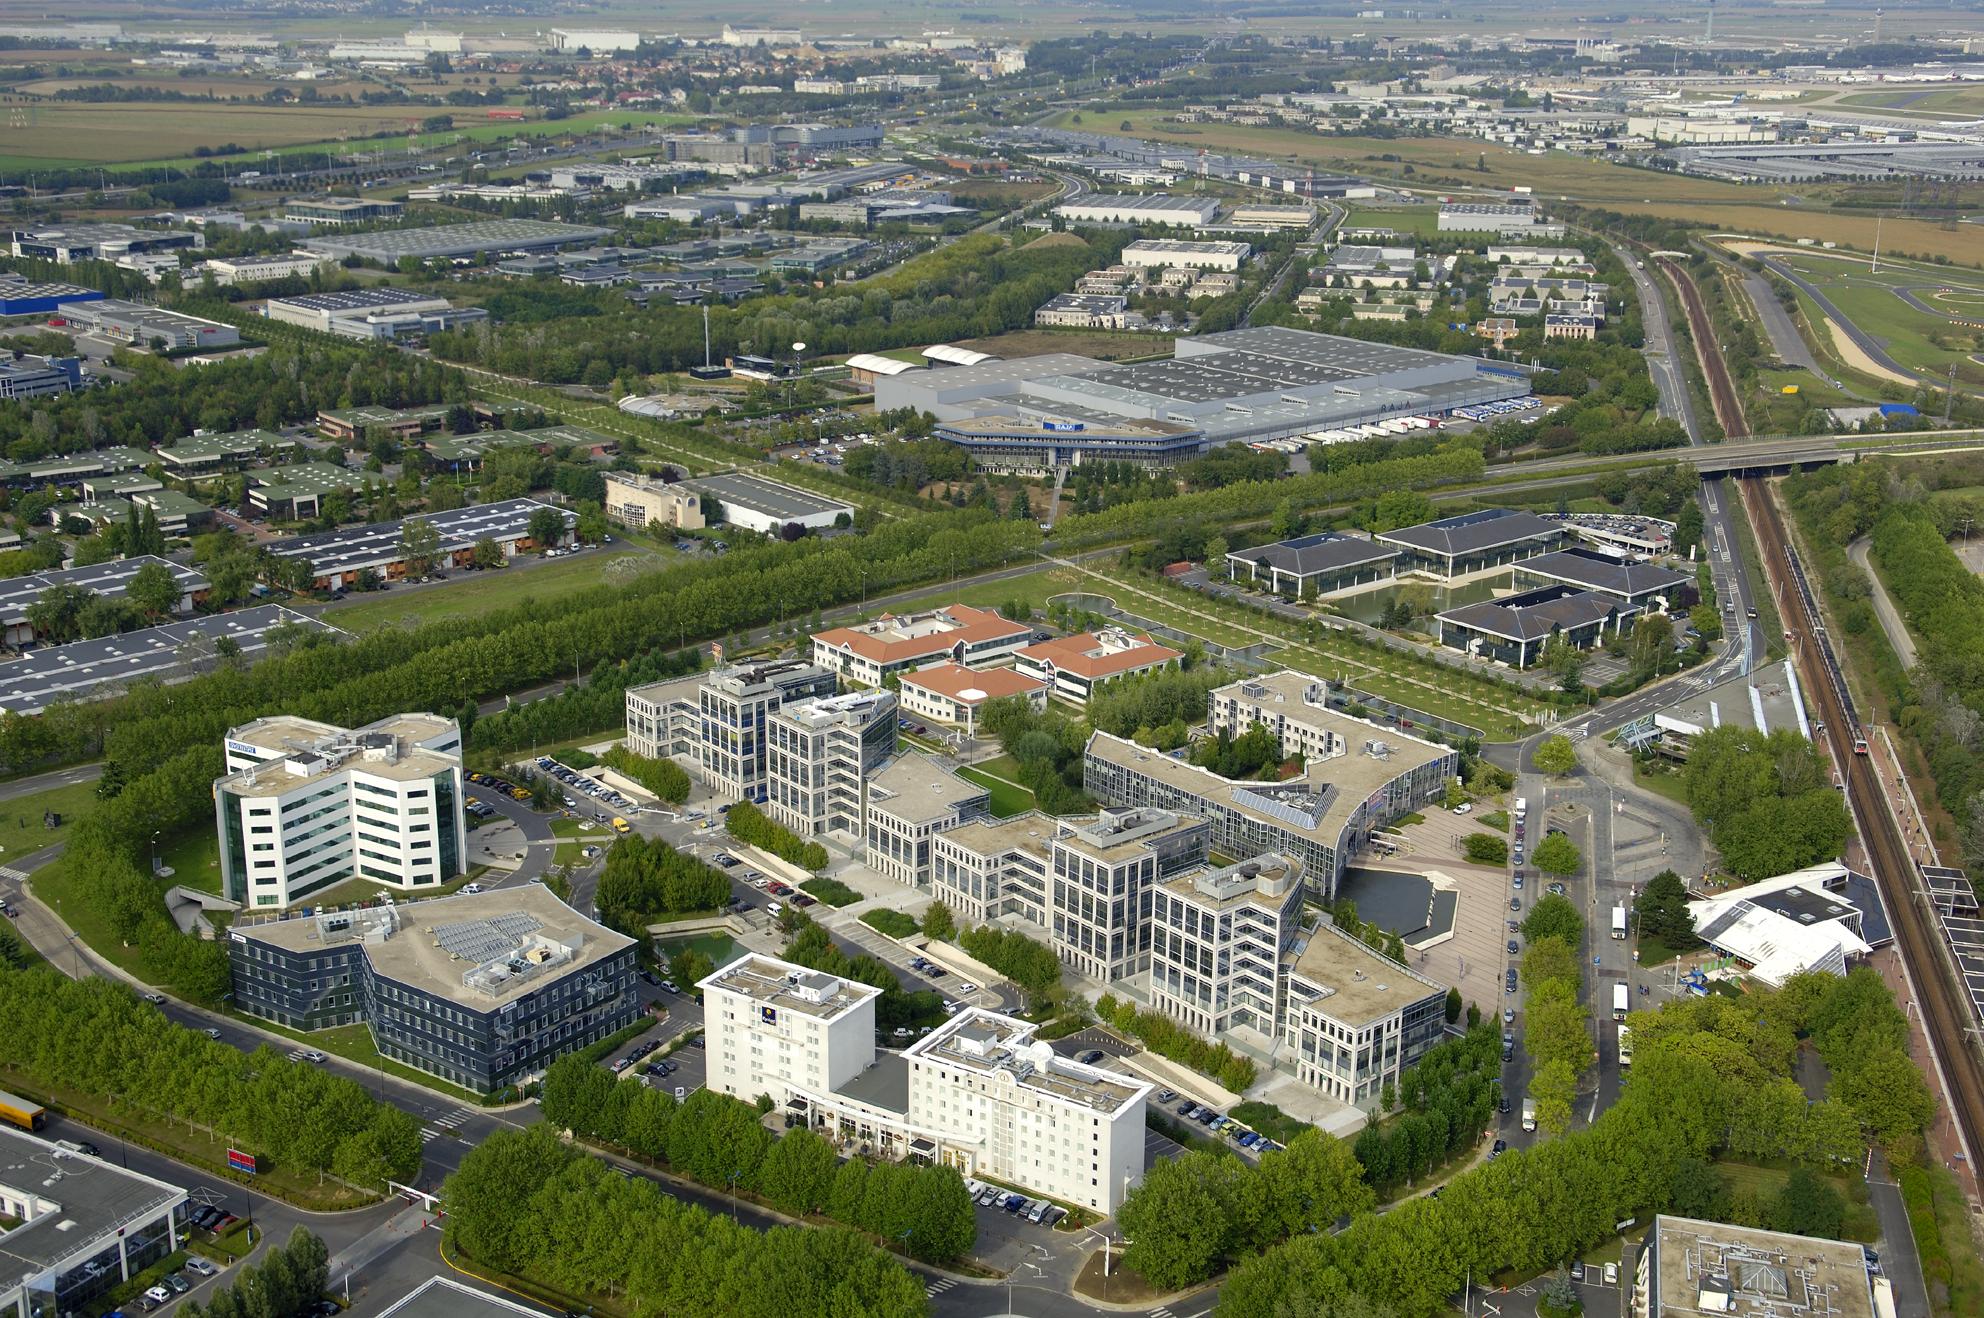 Paris Nord Villepinte